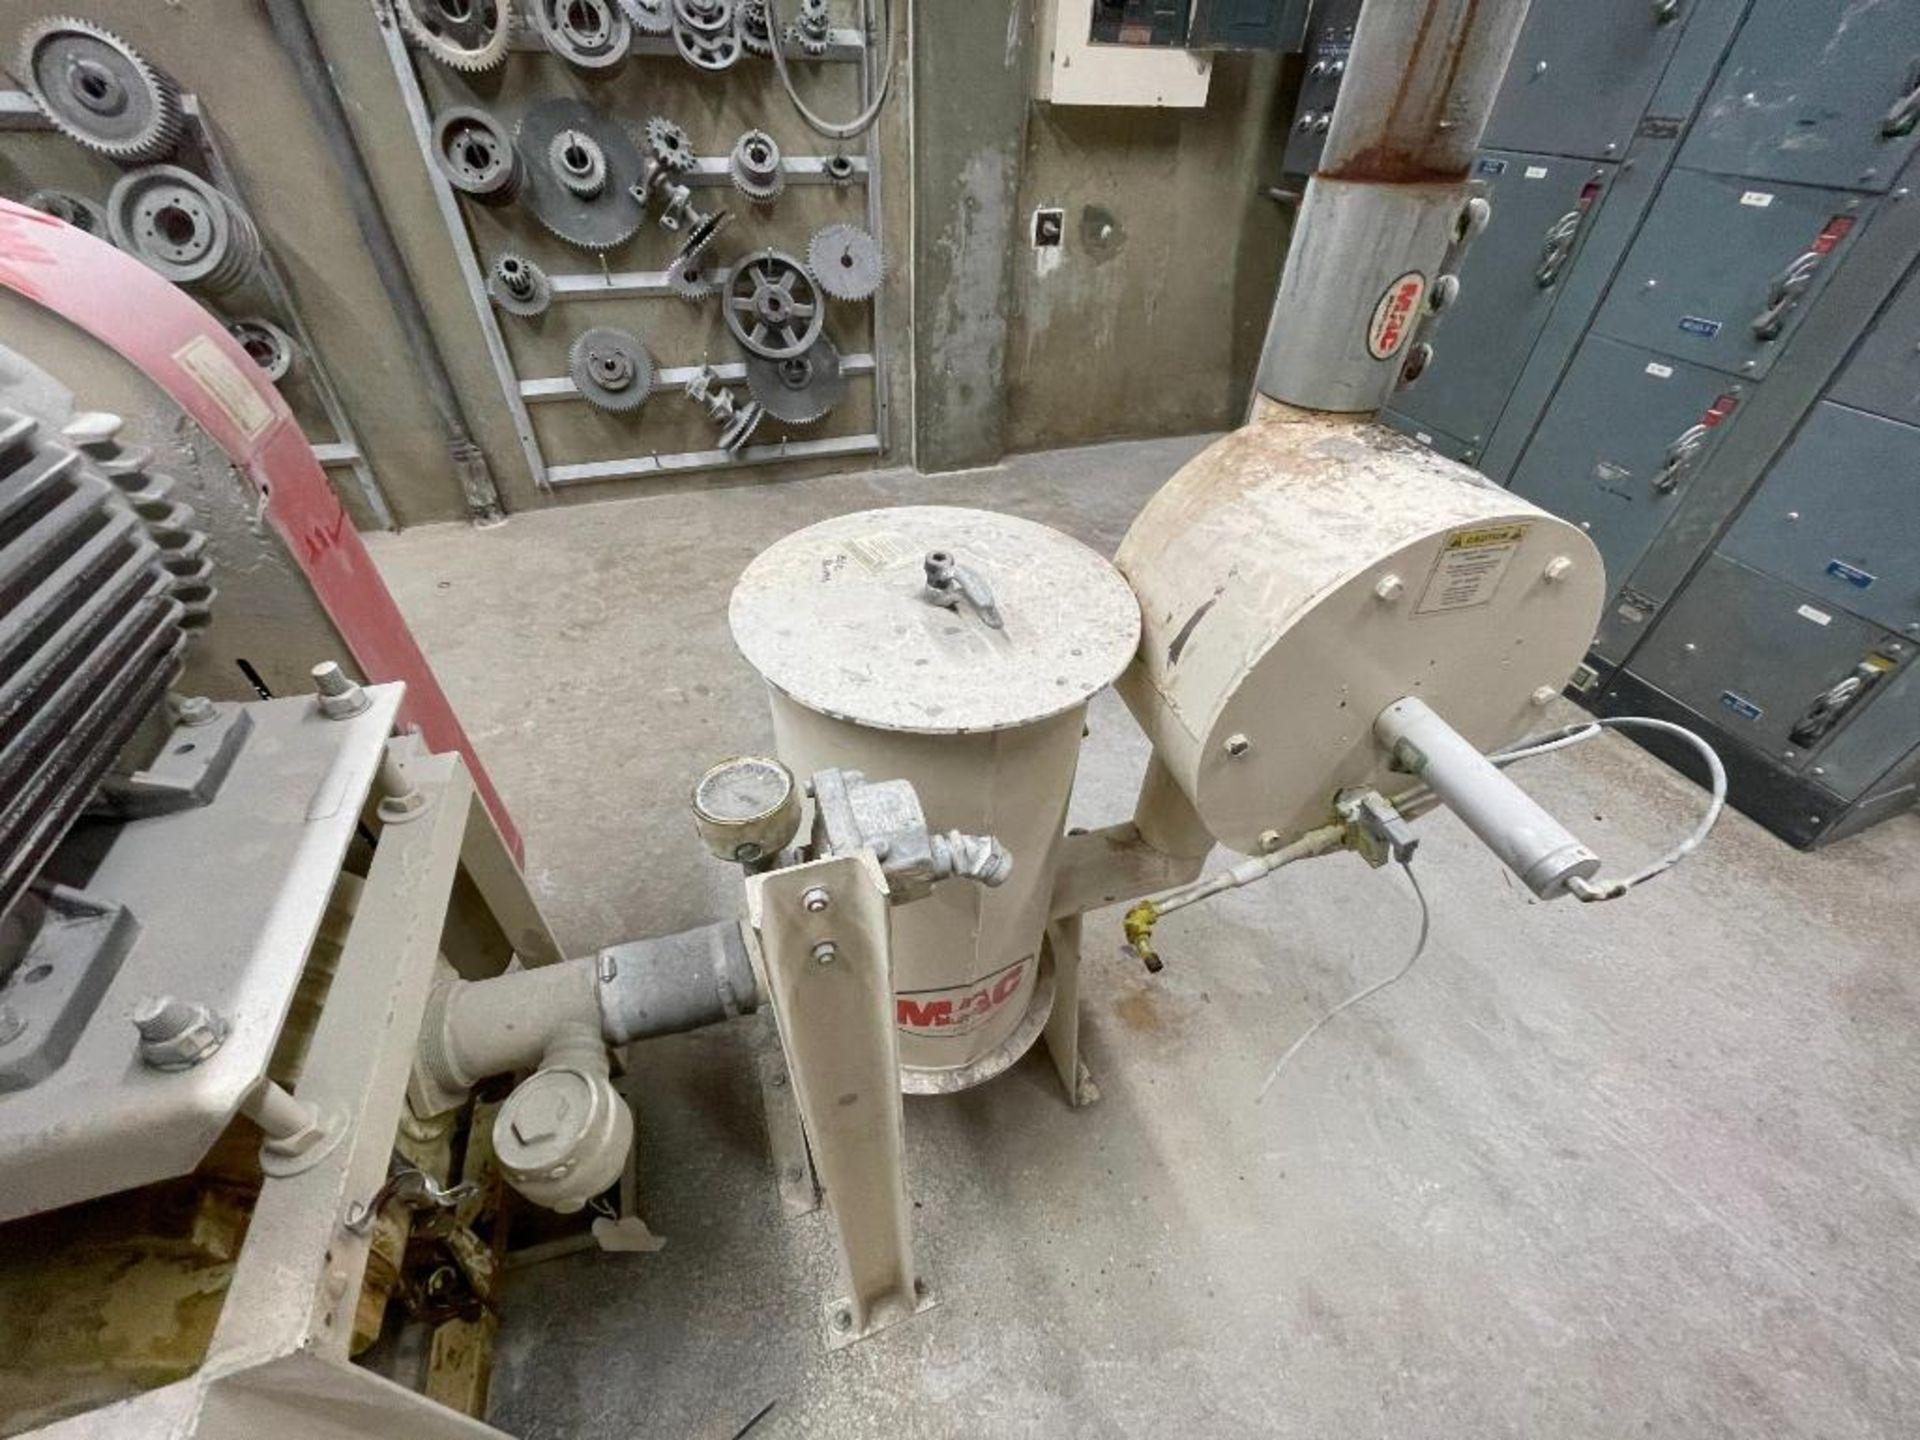 Sutorbilt rotary positive blower - Image 9 of 21